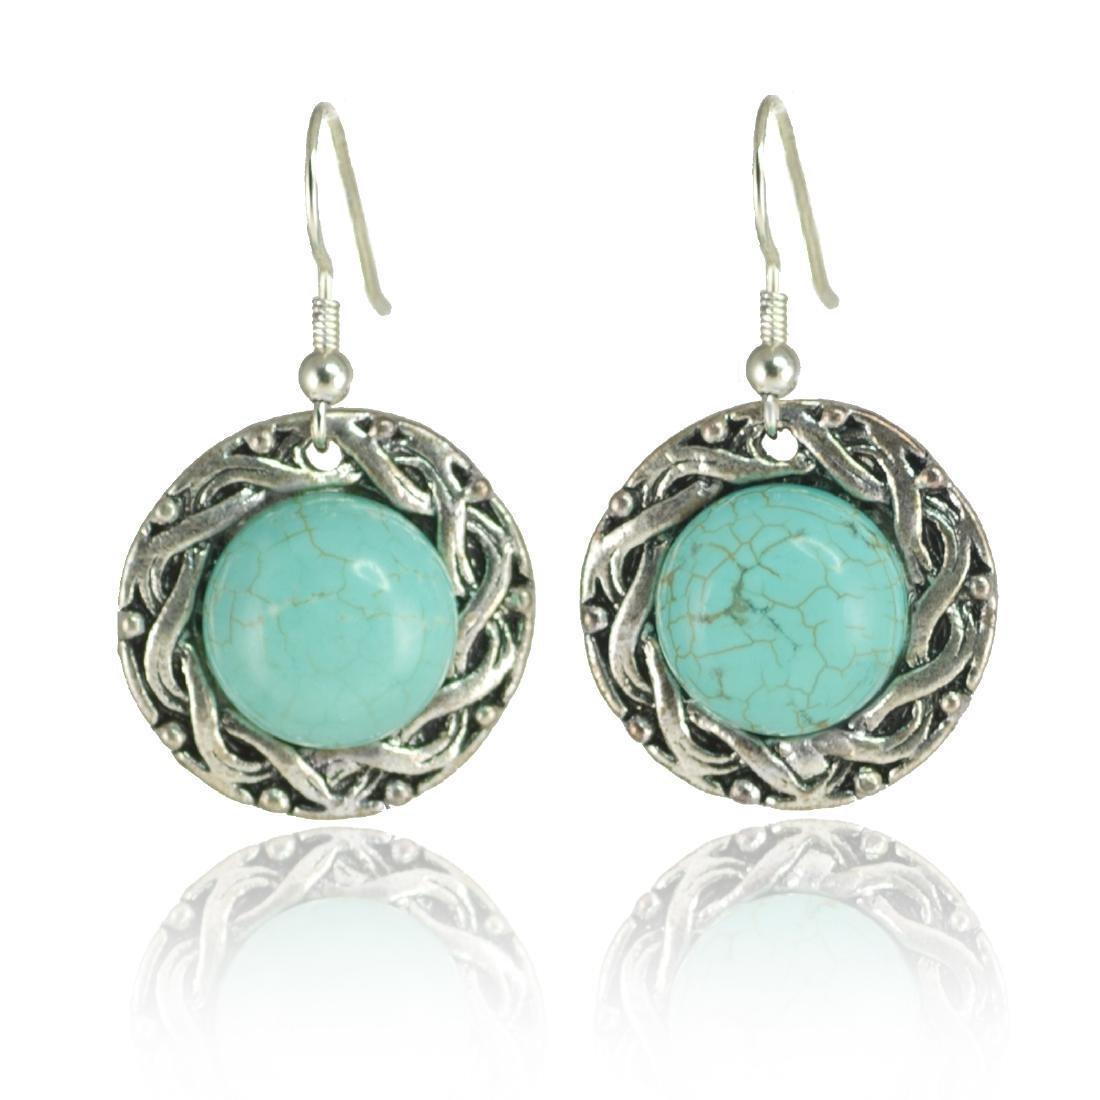 Ethnic Style Turquoise Howlite Earrings